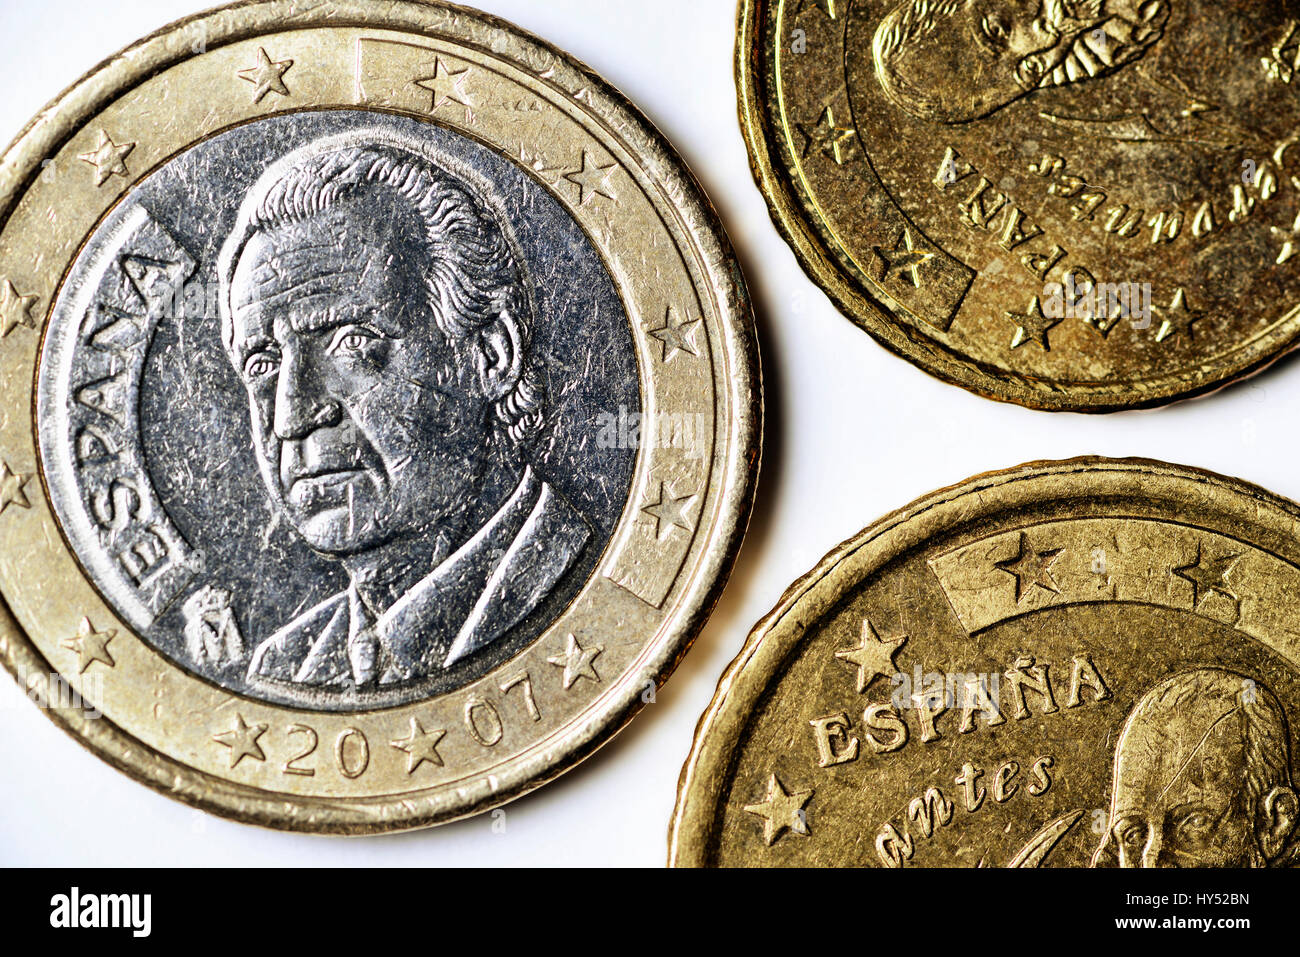 Spanish eurocoins, debt crisis in Spain, Spanische Euromuenzen, Schuldenkrise in Spanien Stock Photo